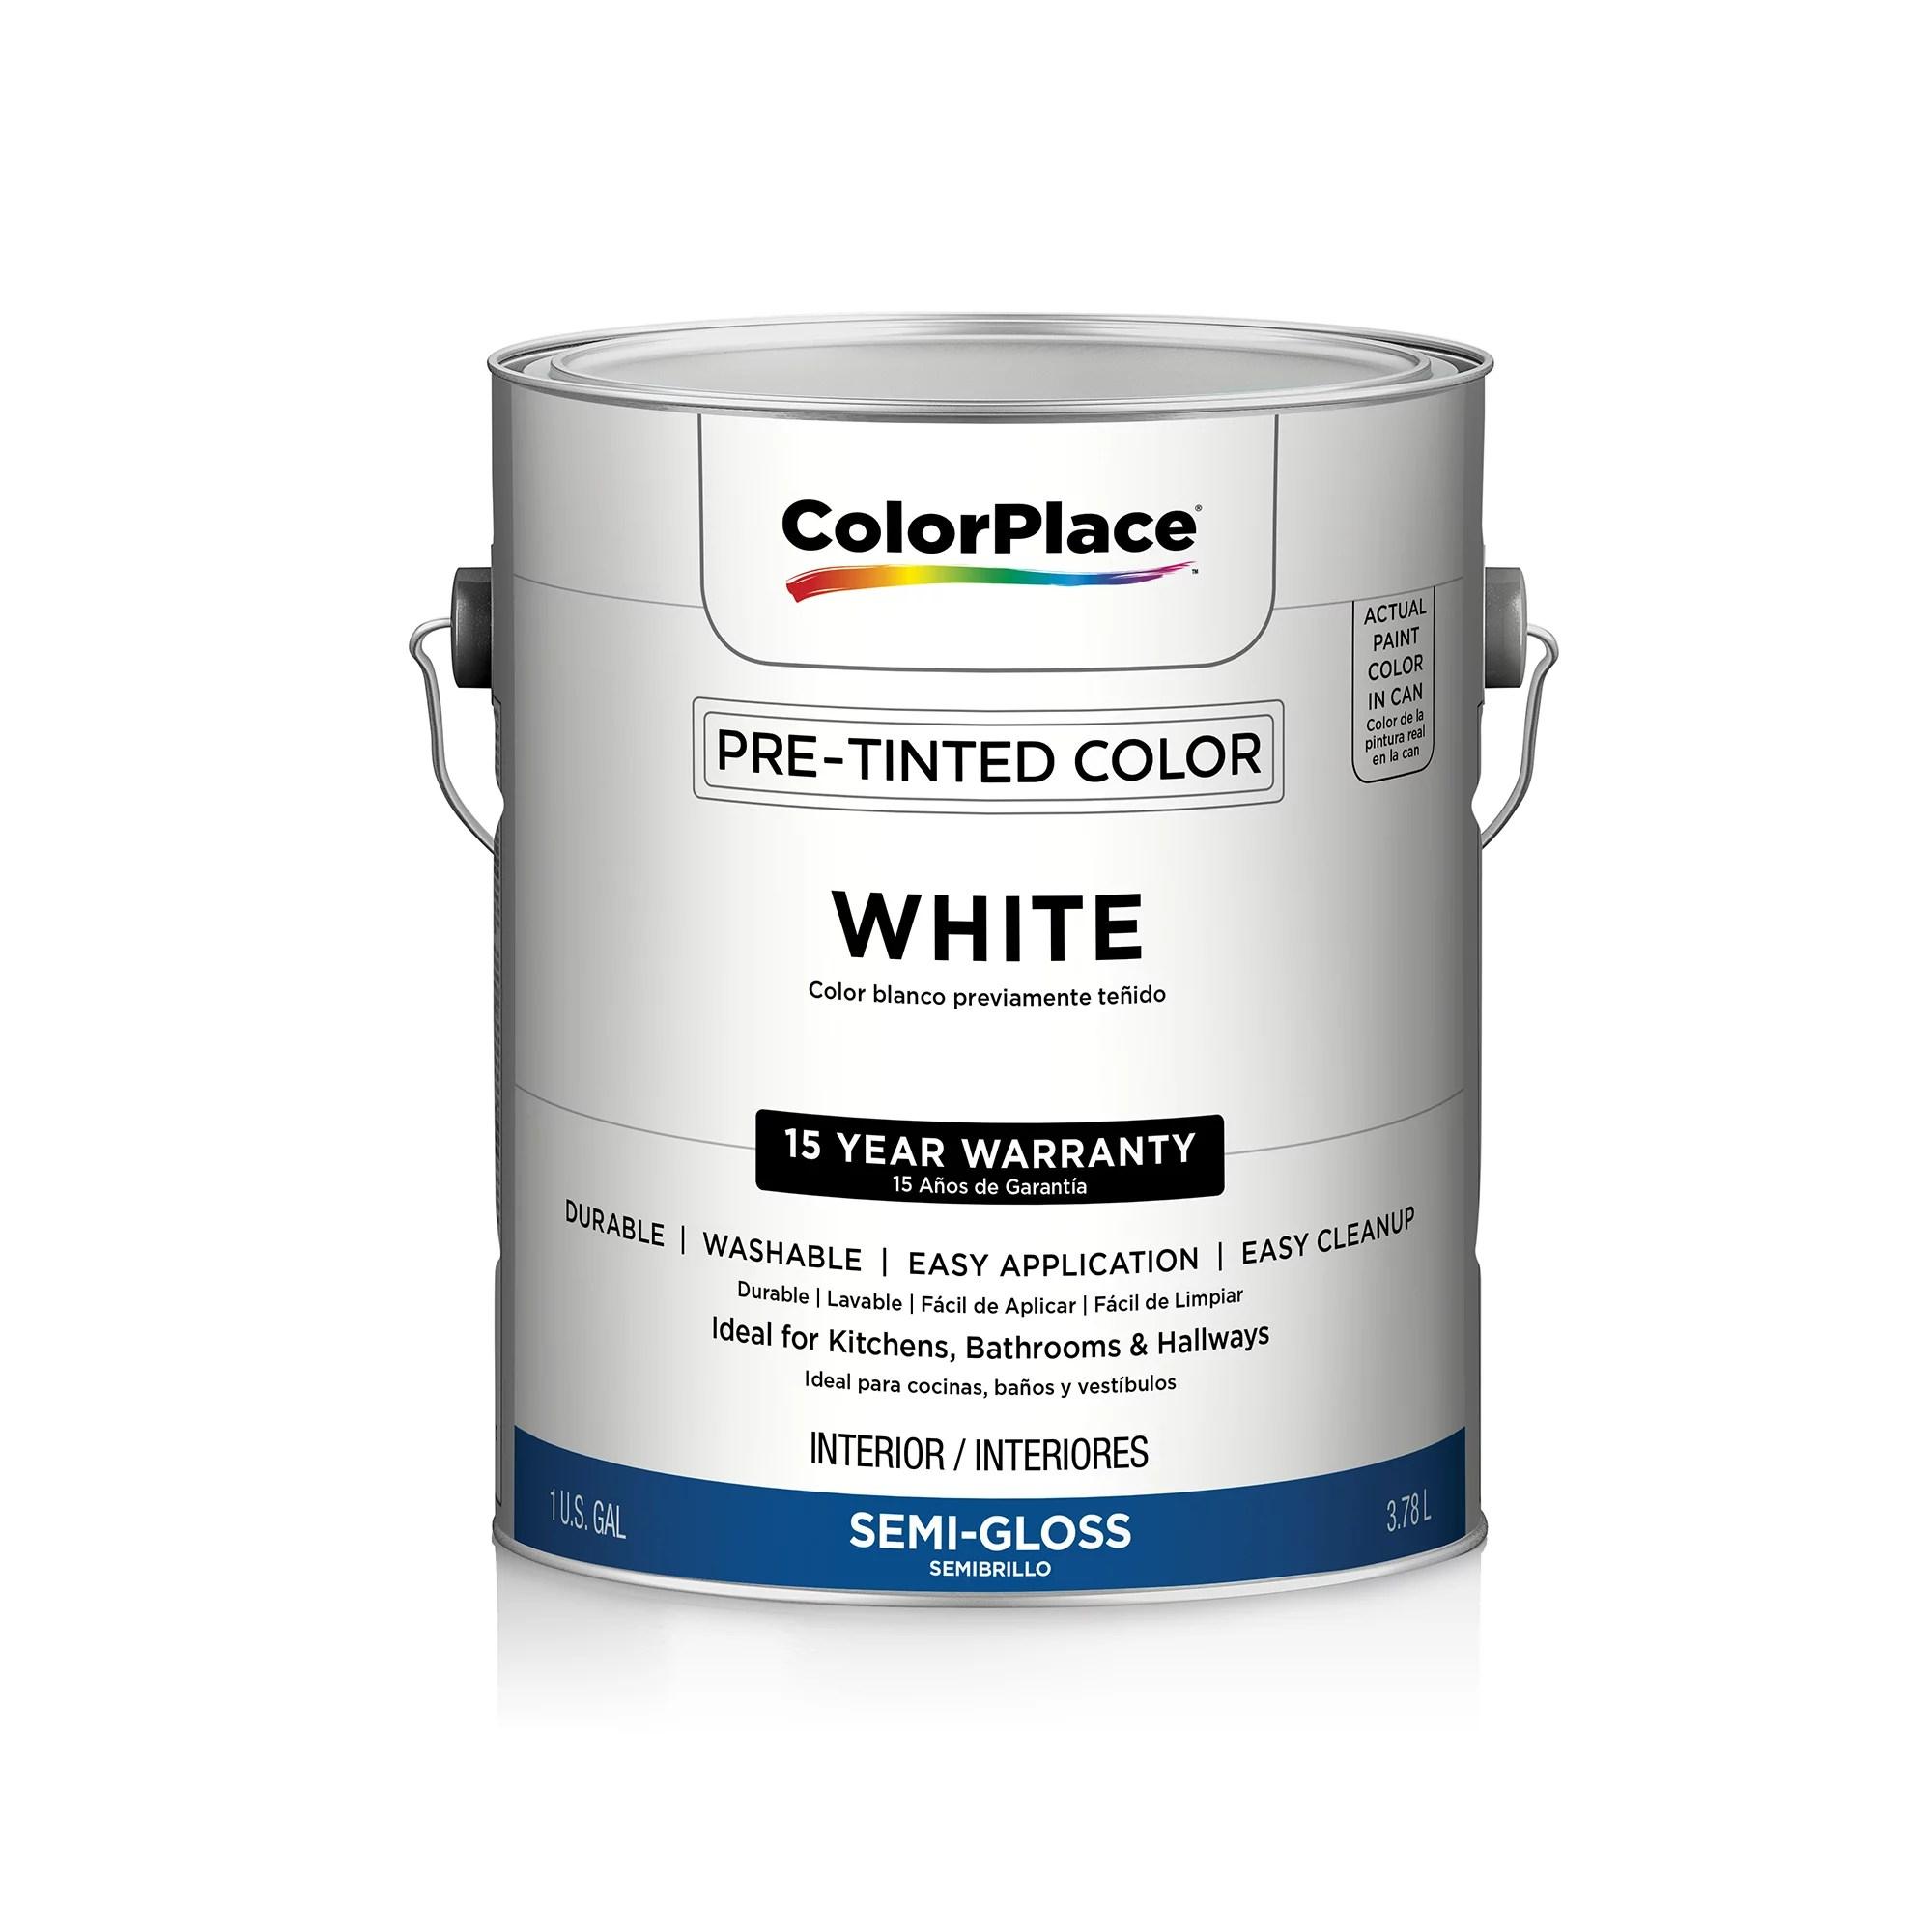 Color place interior semi gloss paint white also walmart rh